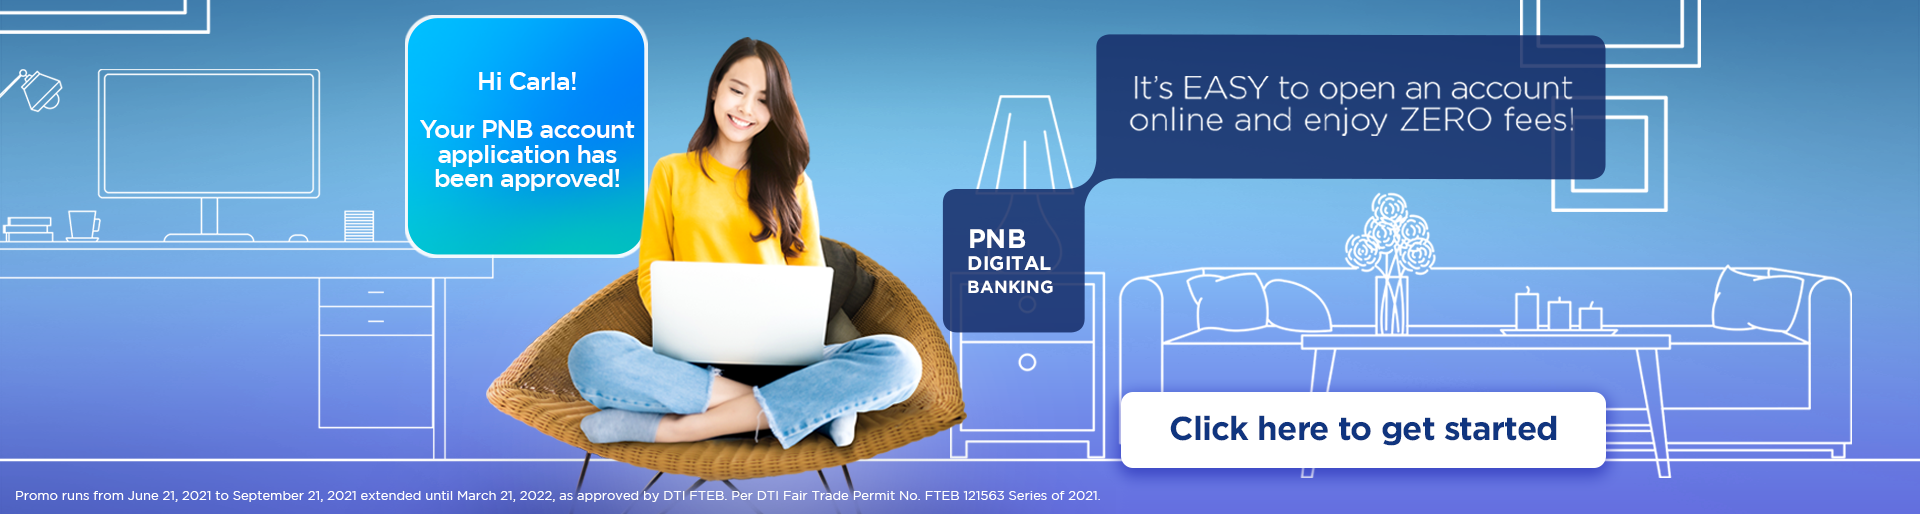 PNB Online Account Application